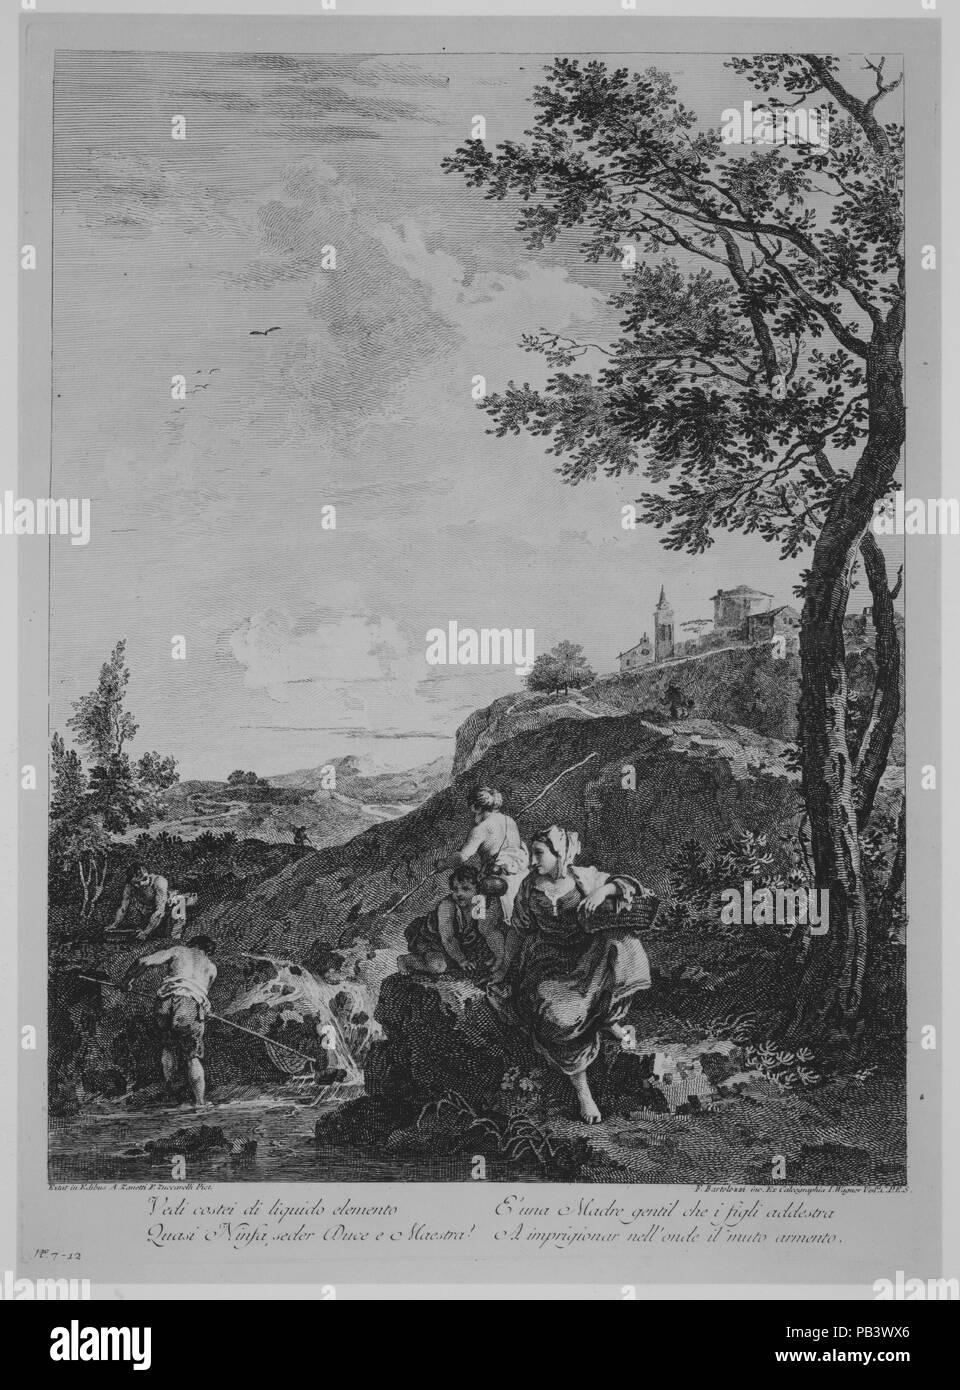 "Paisaje, ""Vedi costei di liquido elemento..."". Artista: Francesco Bartolozzi (Italiano, Florencia Lisboa 1728-1815); después, Francesco Zuccarelli, Pitigliano 1702-1788 Italiano (Florencia). Dimensiones: placa: 18 1/8 x 14 pulg. (46 x 35,5 cm) Hoja: 19 15/16 x 14 5/16 in. (50,7 x 36,3 cm). Editorial: Publicado por Joseph Wagner (Italiano, 1706-1780 Thalendorf , Venecia Venecia). Fecha: 1762. Museo: Museo Metropolitano de Arte, Nueva York, Estados Unidos. Imagen De Stock"